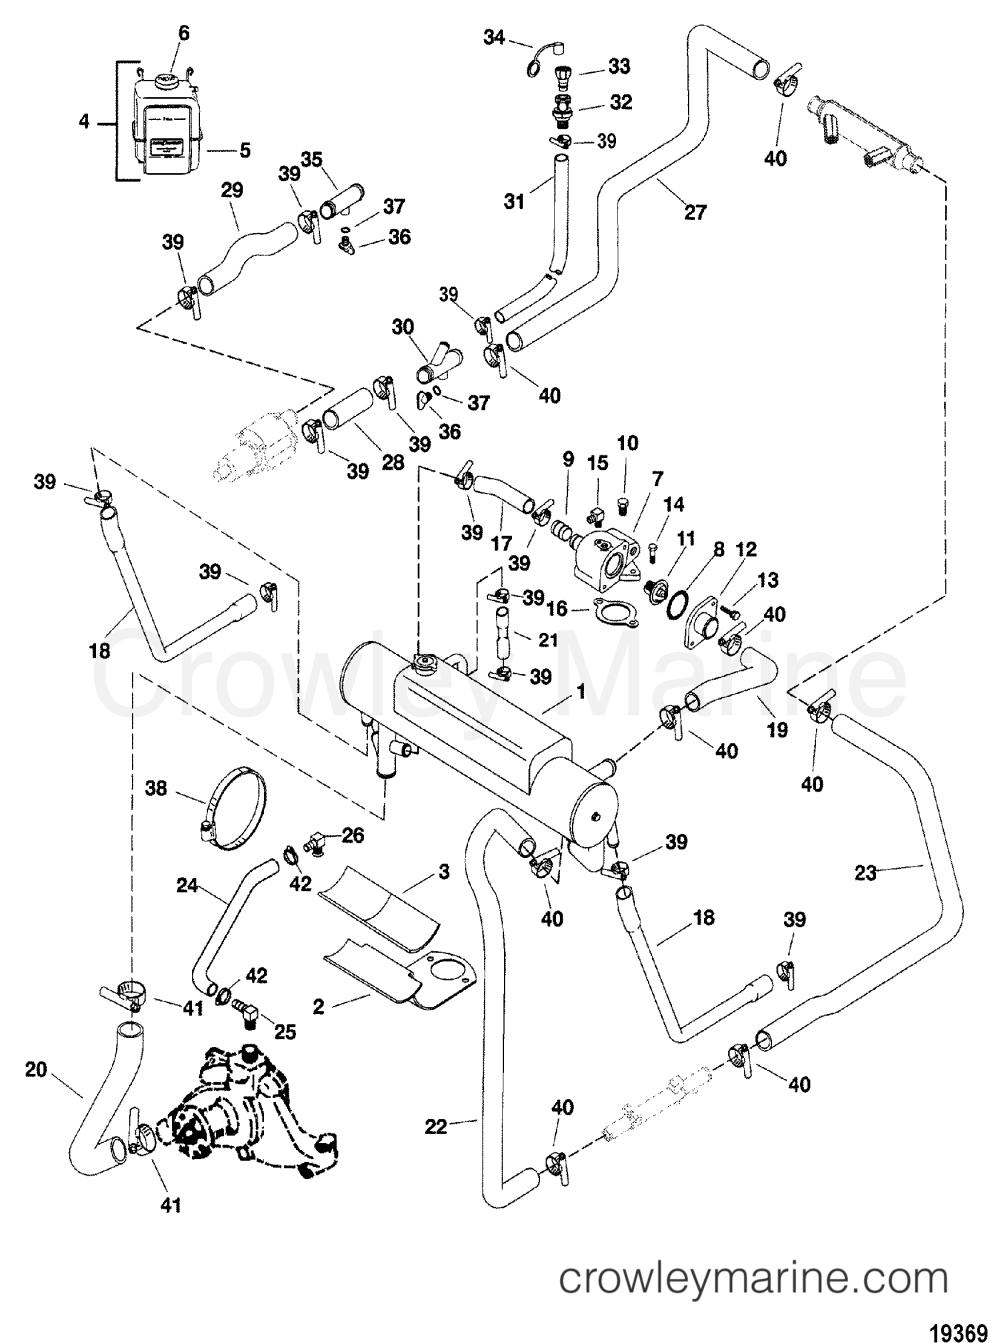 medium resolution of 1998 mercury inboard engine 350 mag mpi horiz 3f4107jm1 closed cooling system